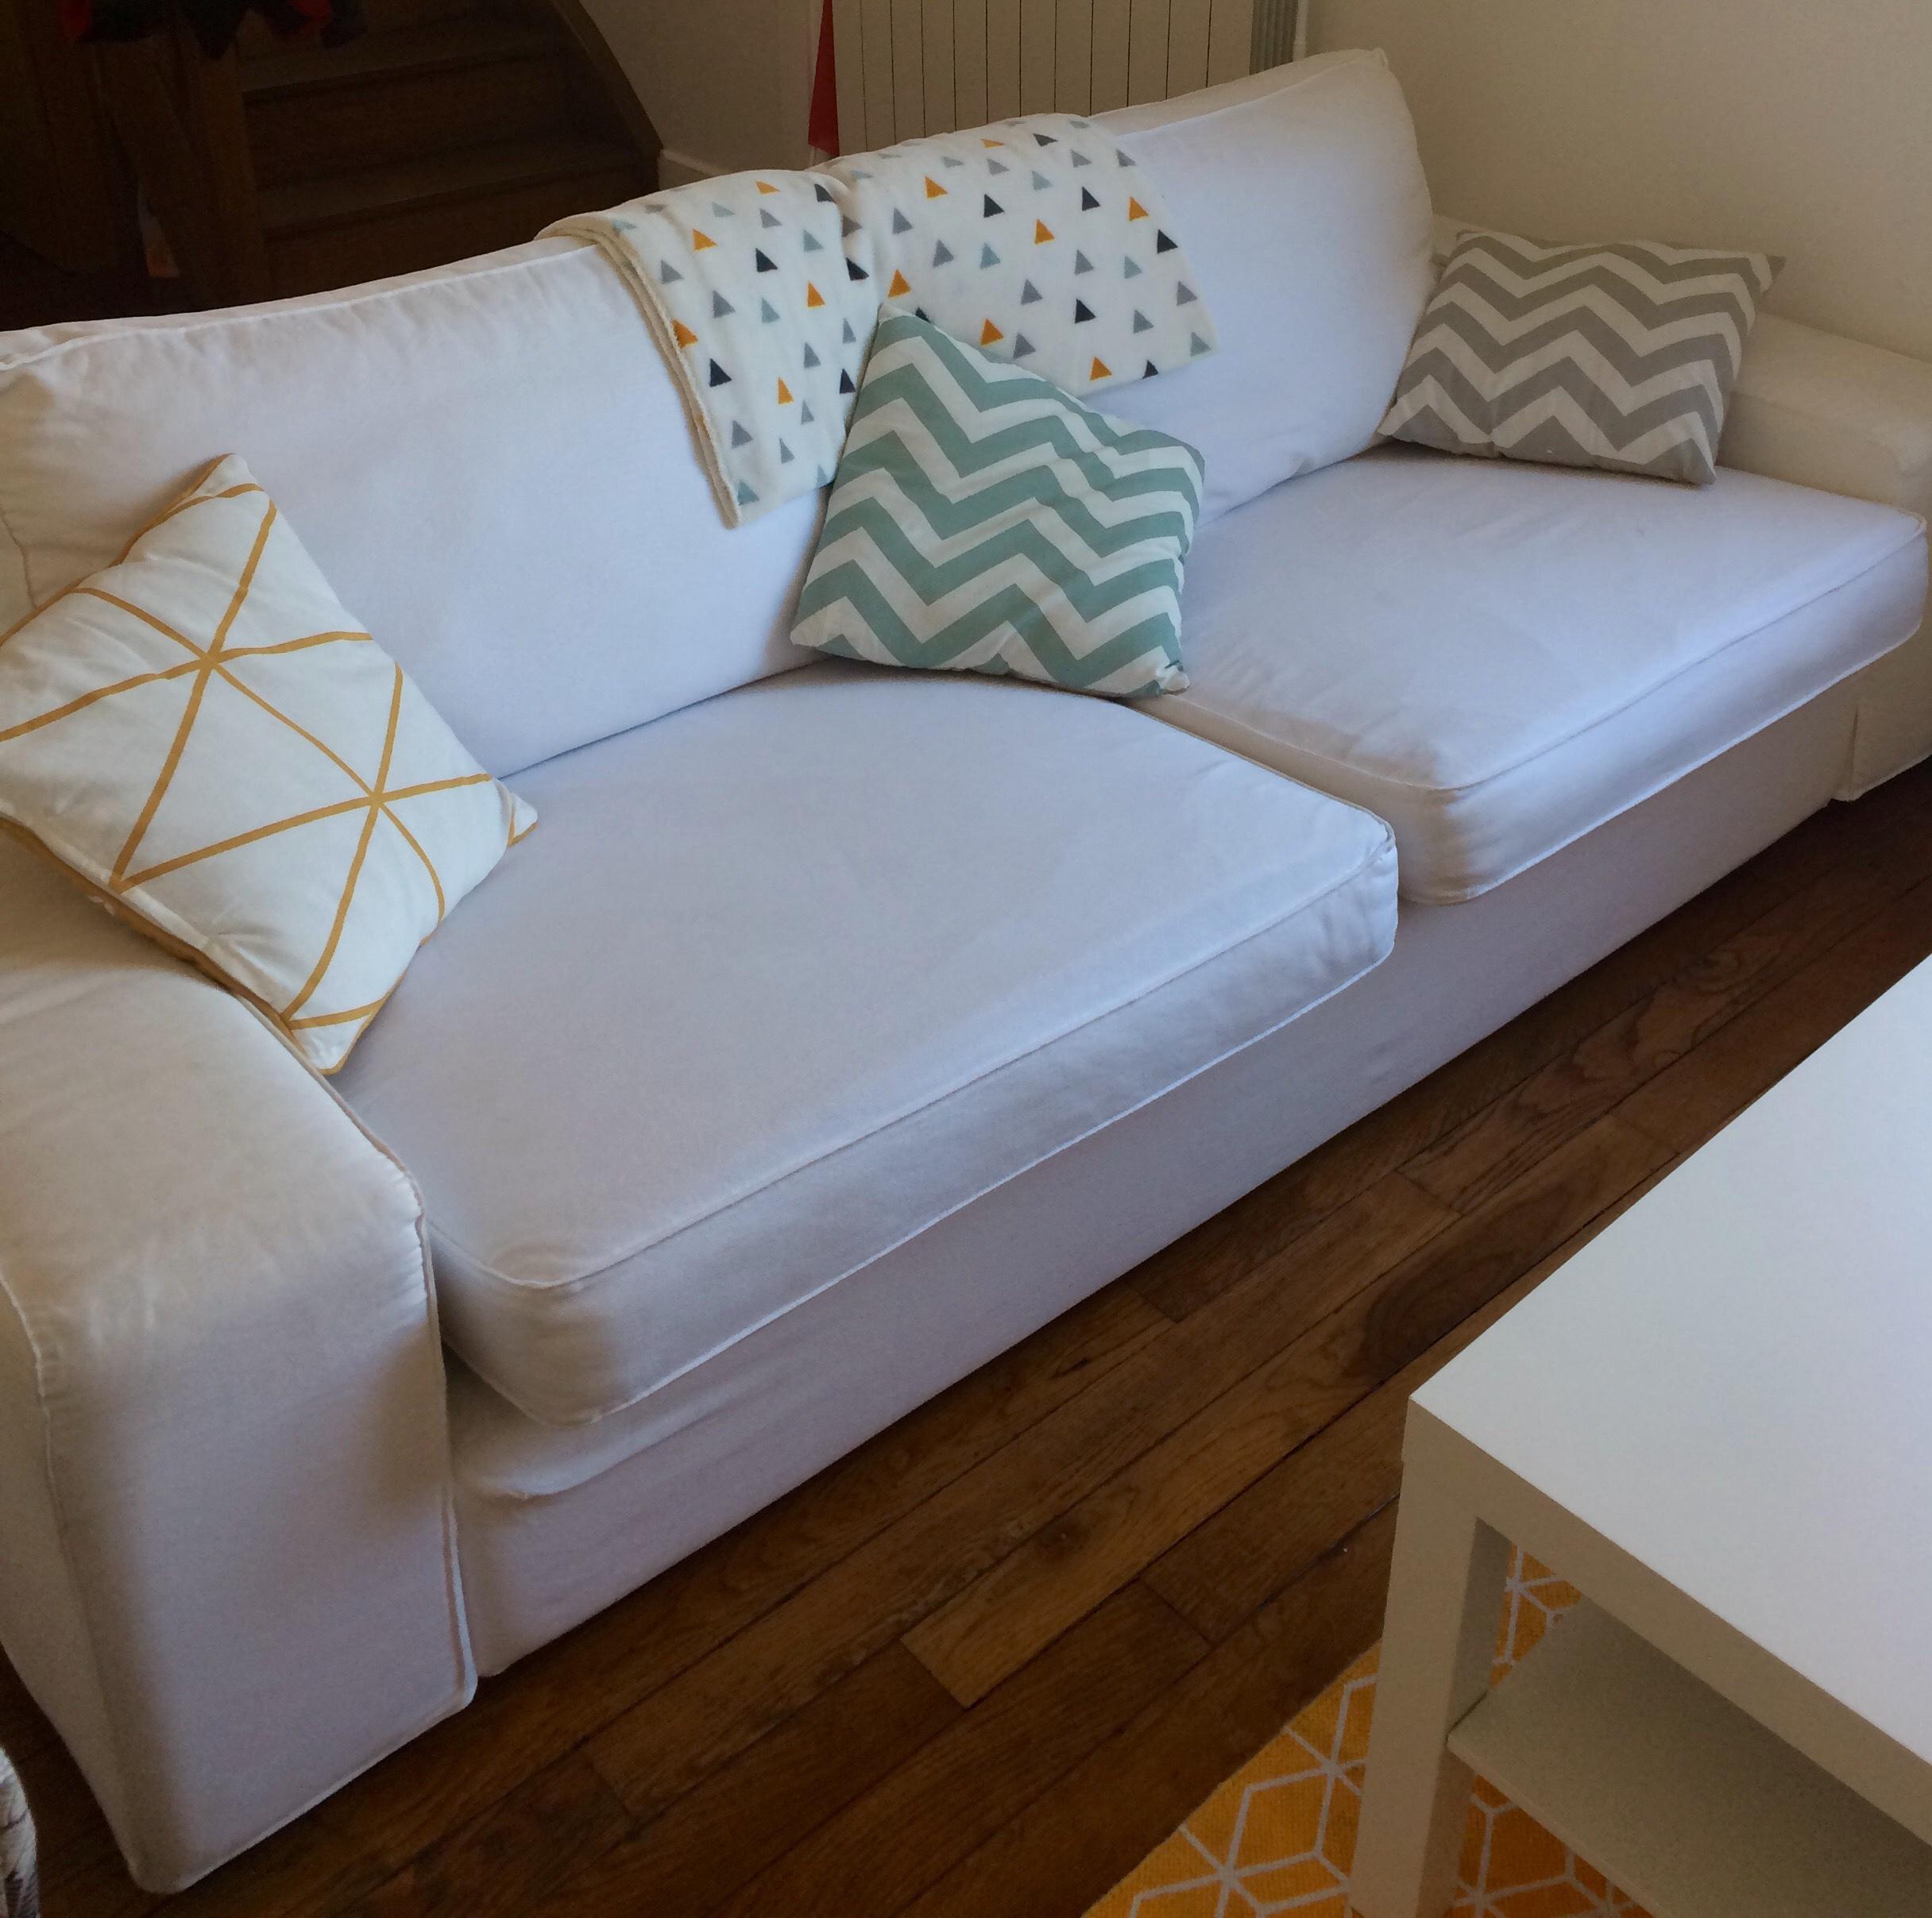 Achetez canap ikea blanc 3 occasion annonce vente sartrouville 78 wb154887676 - Ikea canape pla ces converteerbare ...